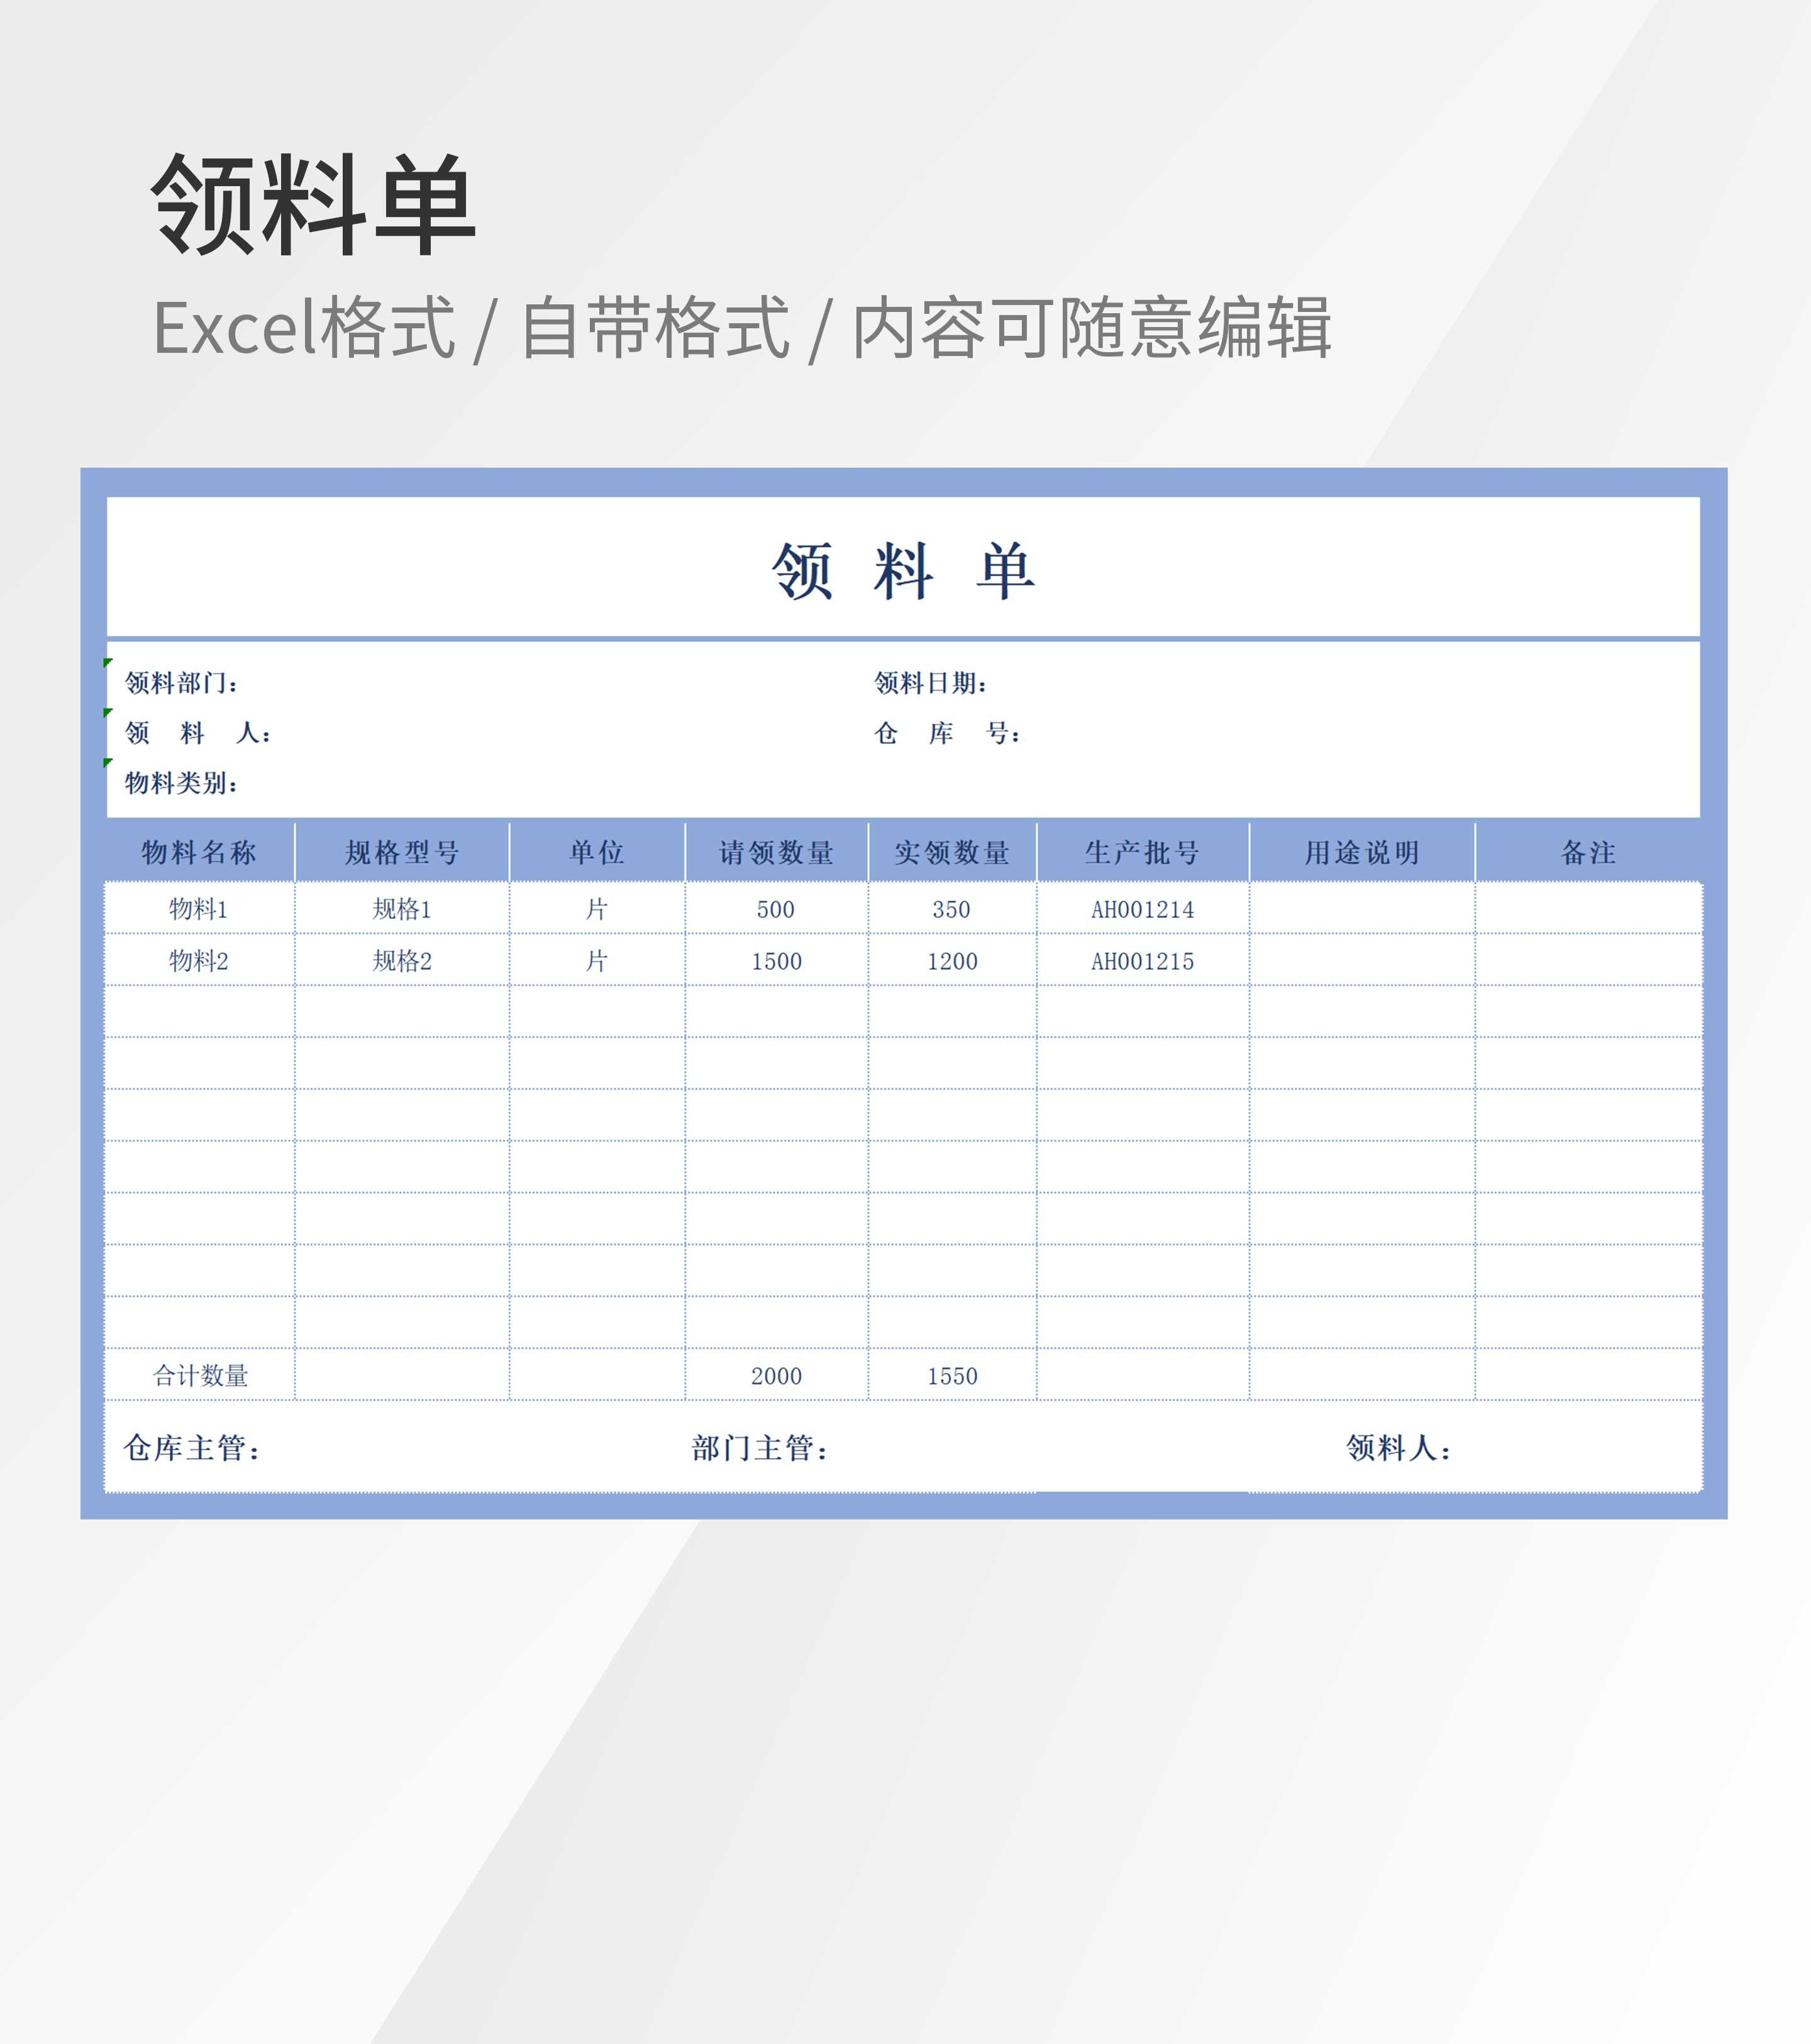 蓝色领料单Excel模板